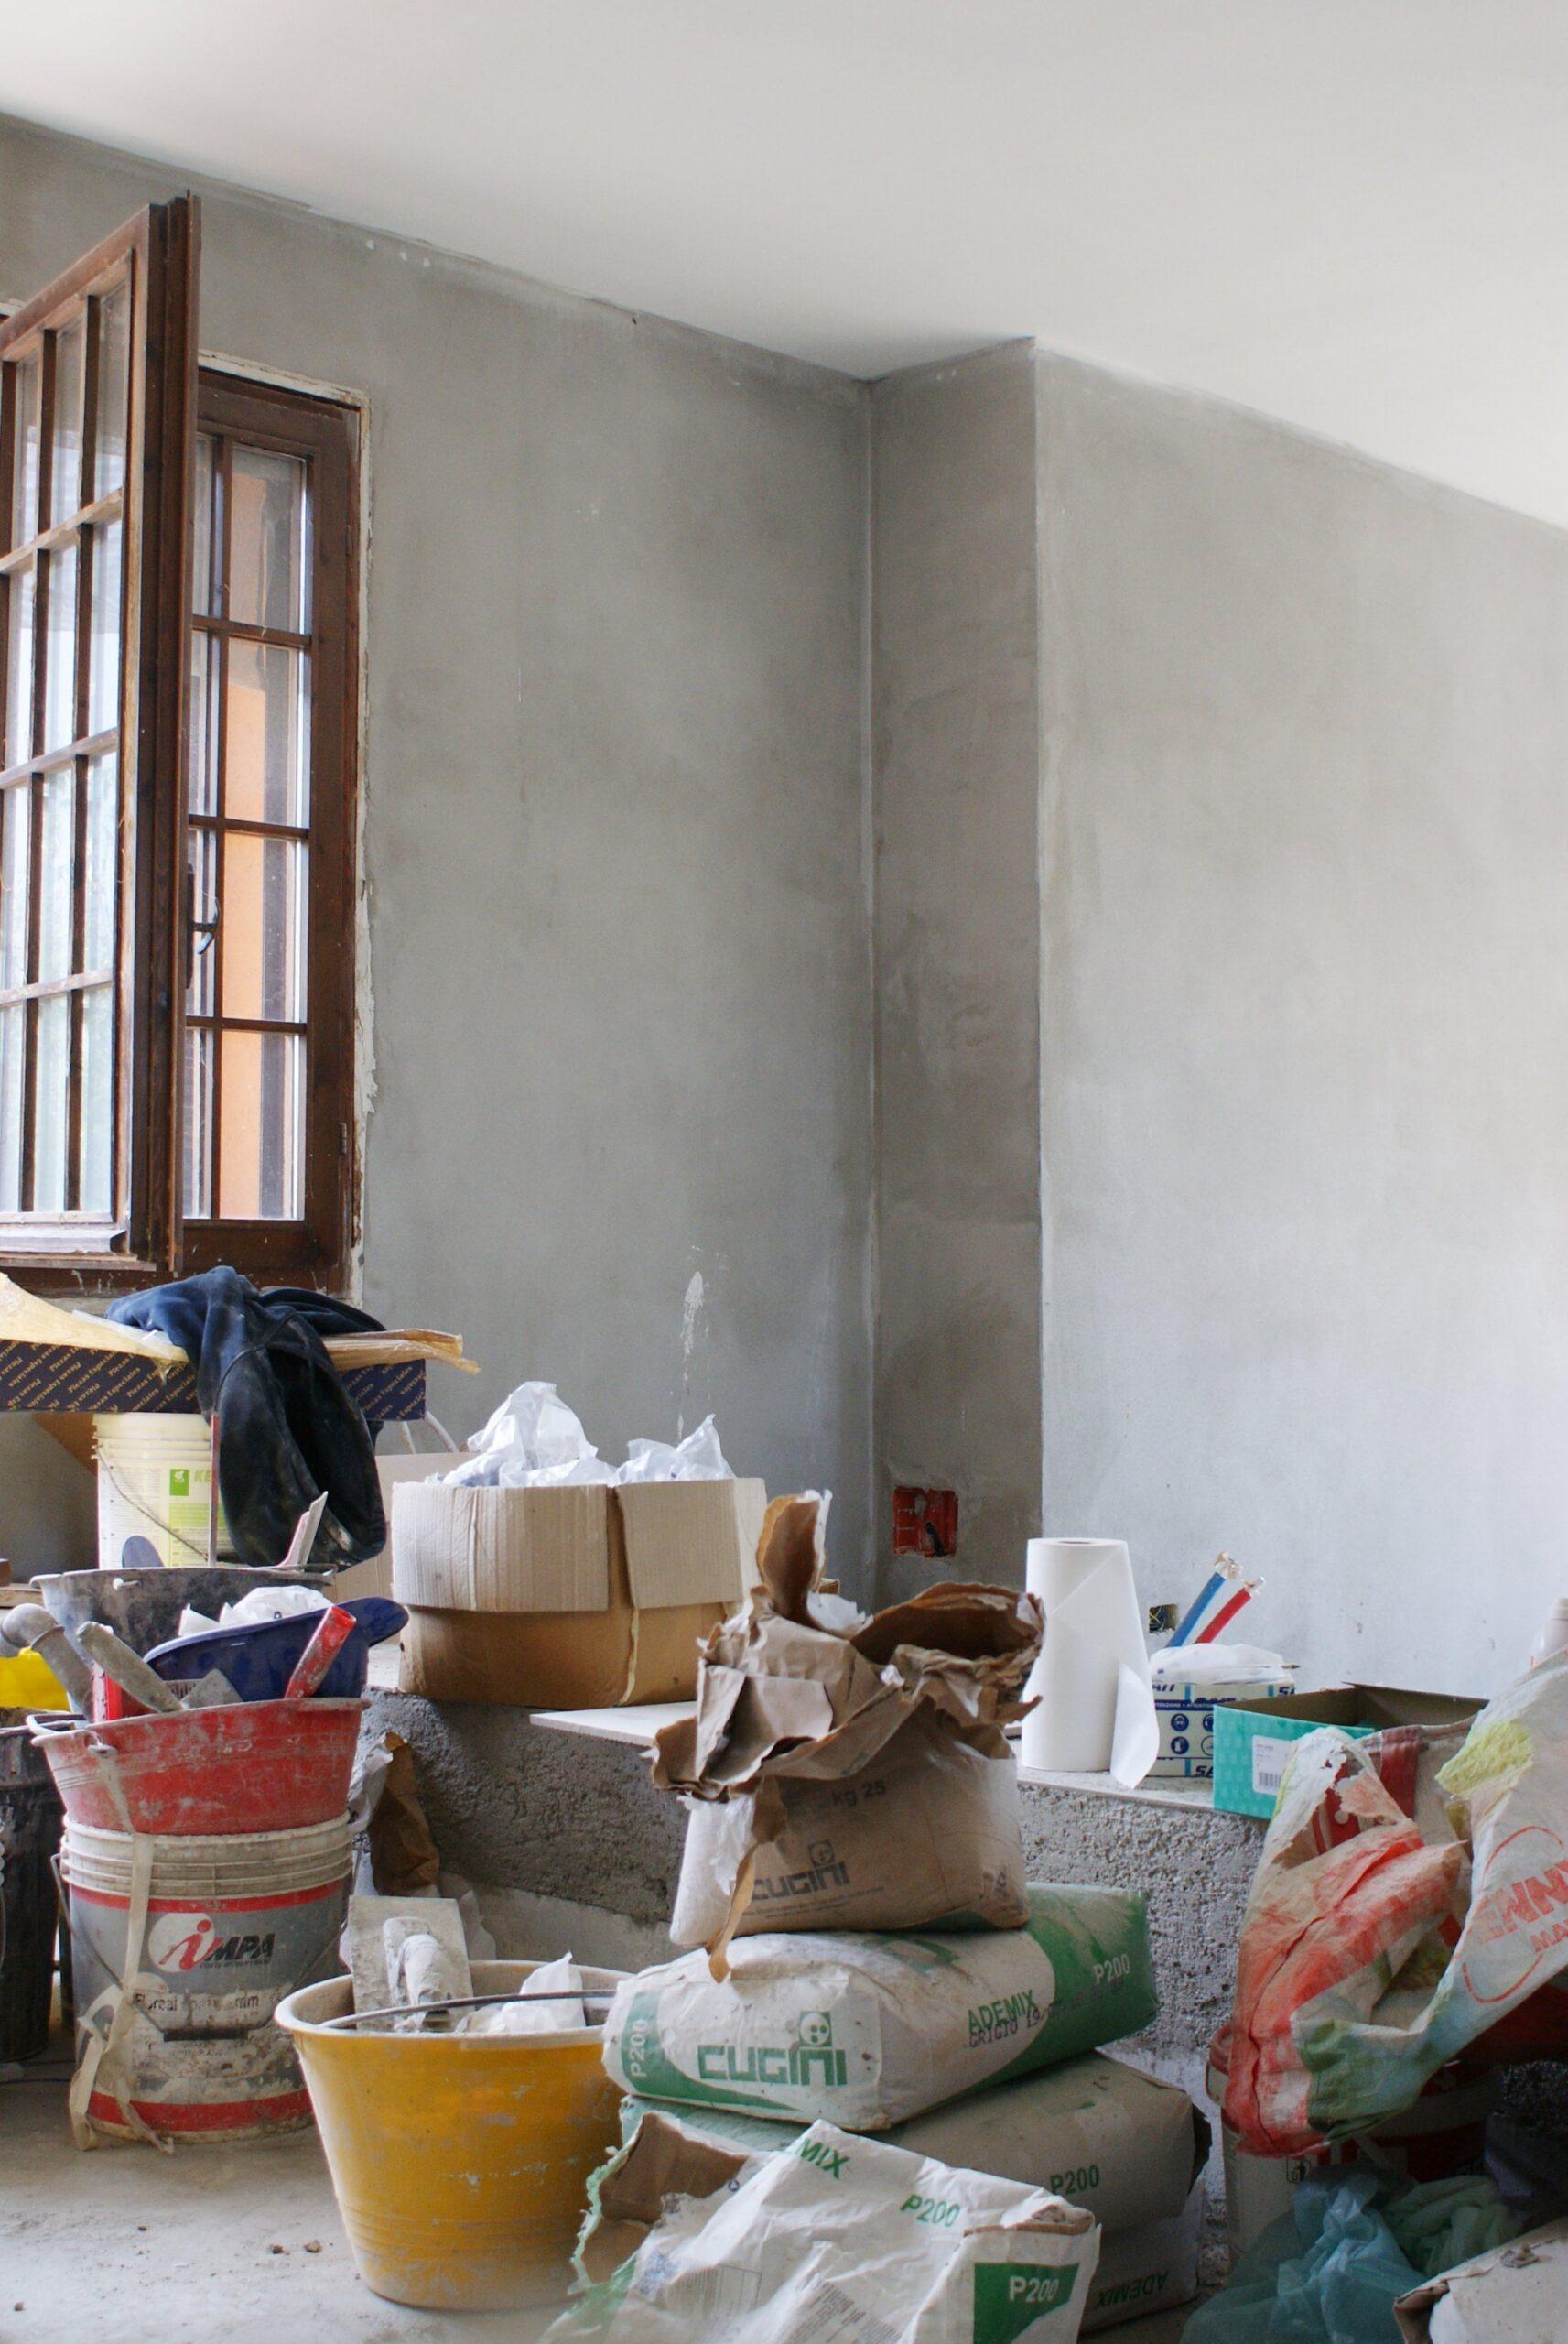 #awwsweethome renovation home guide tips